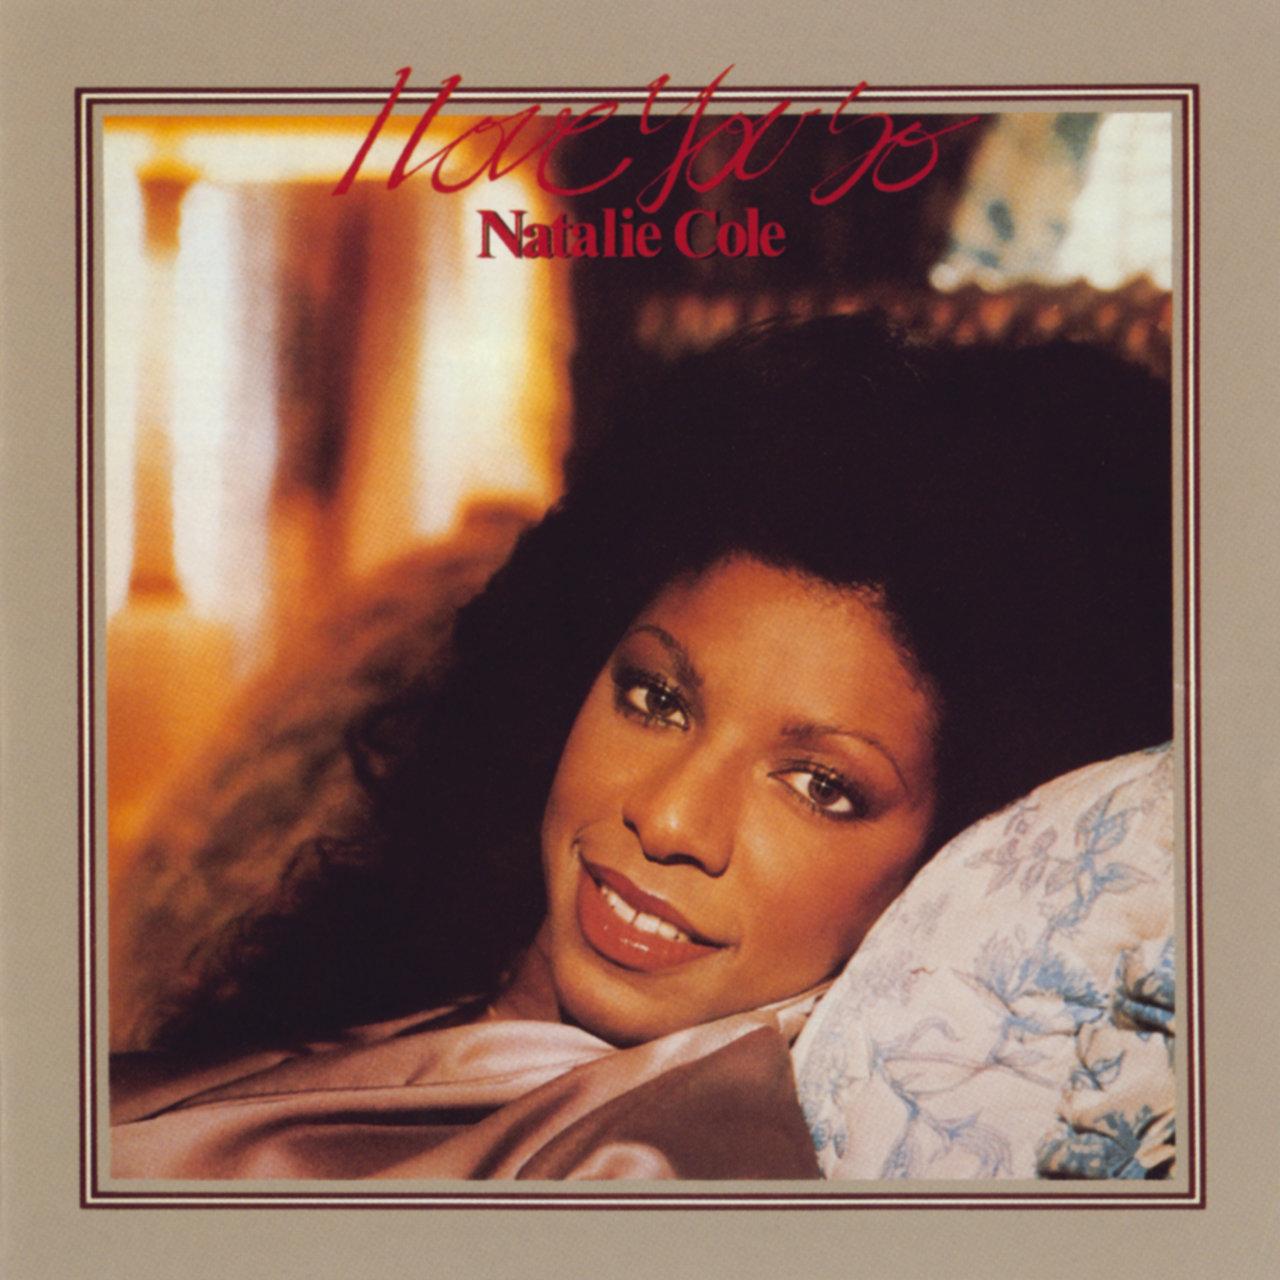 I Love You So Natalie Cole TIDAL